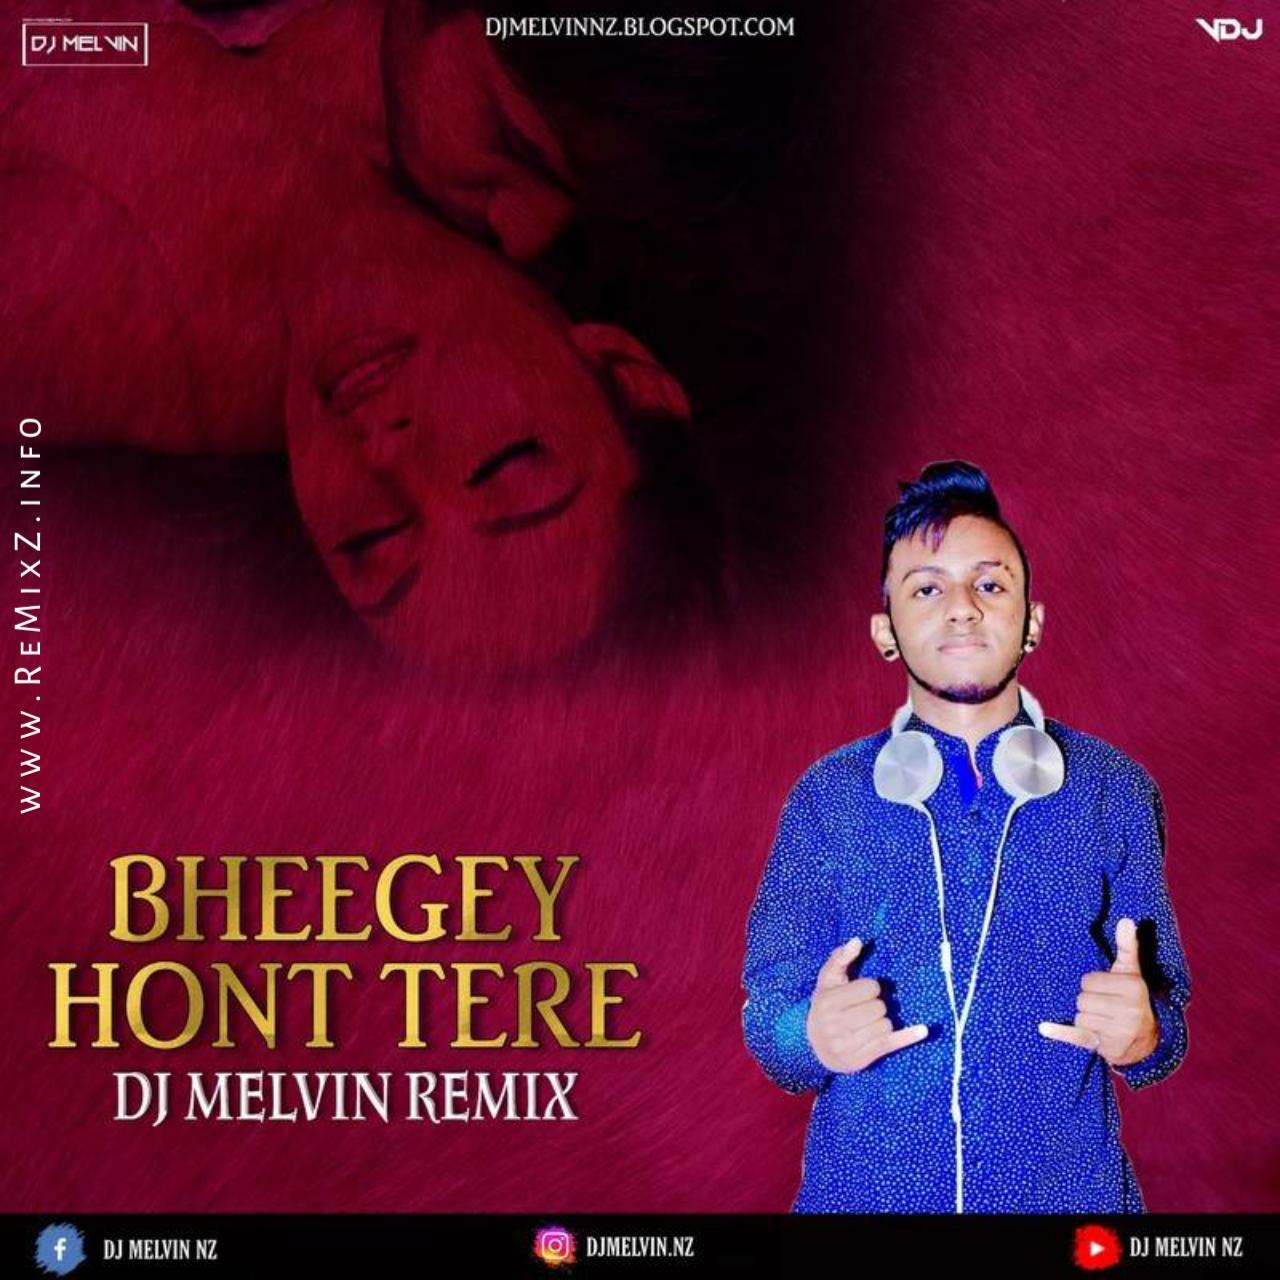 bheegey-hont-tere-remix-dj-melvin-nz.jpg